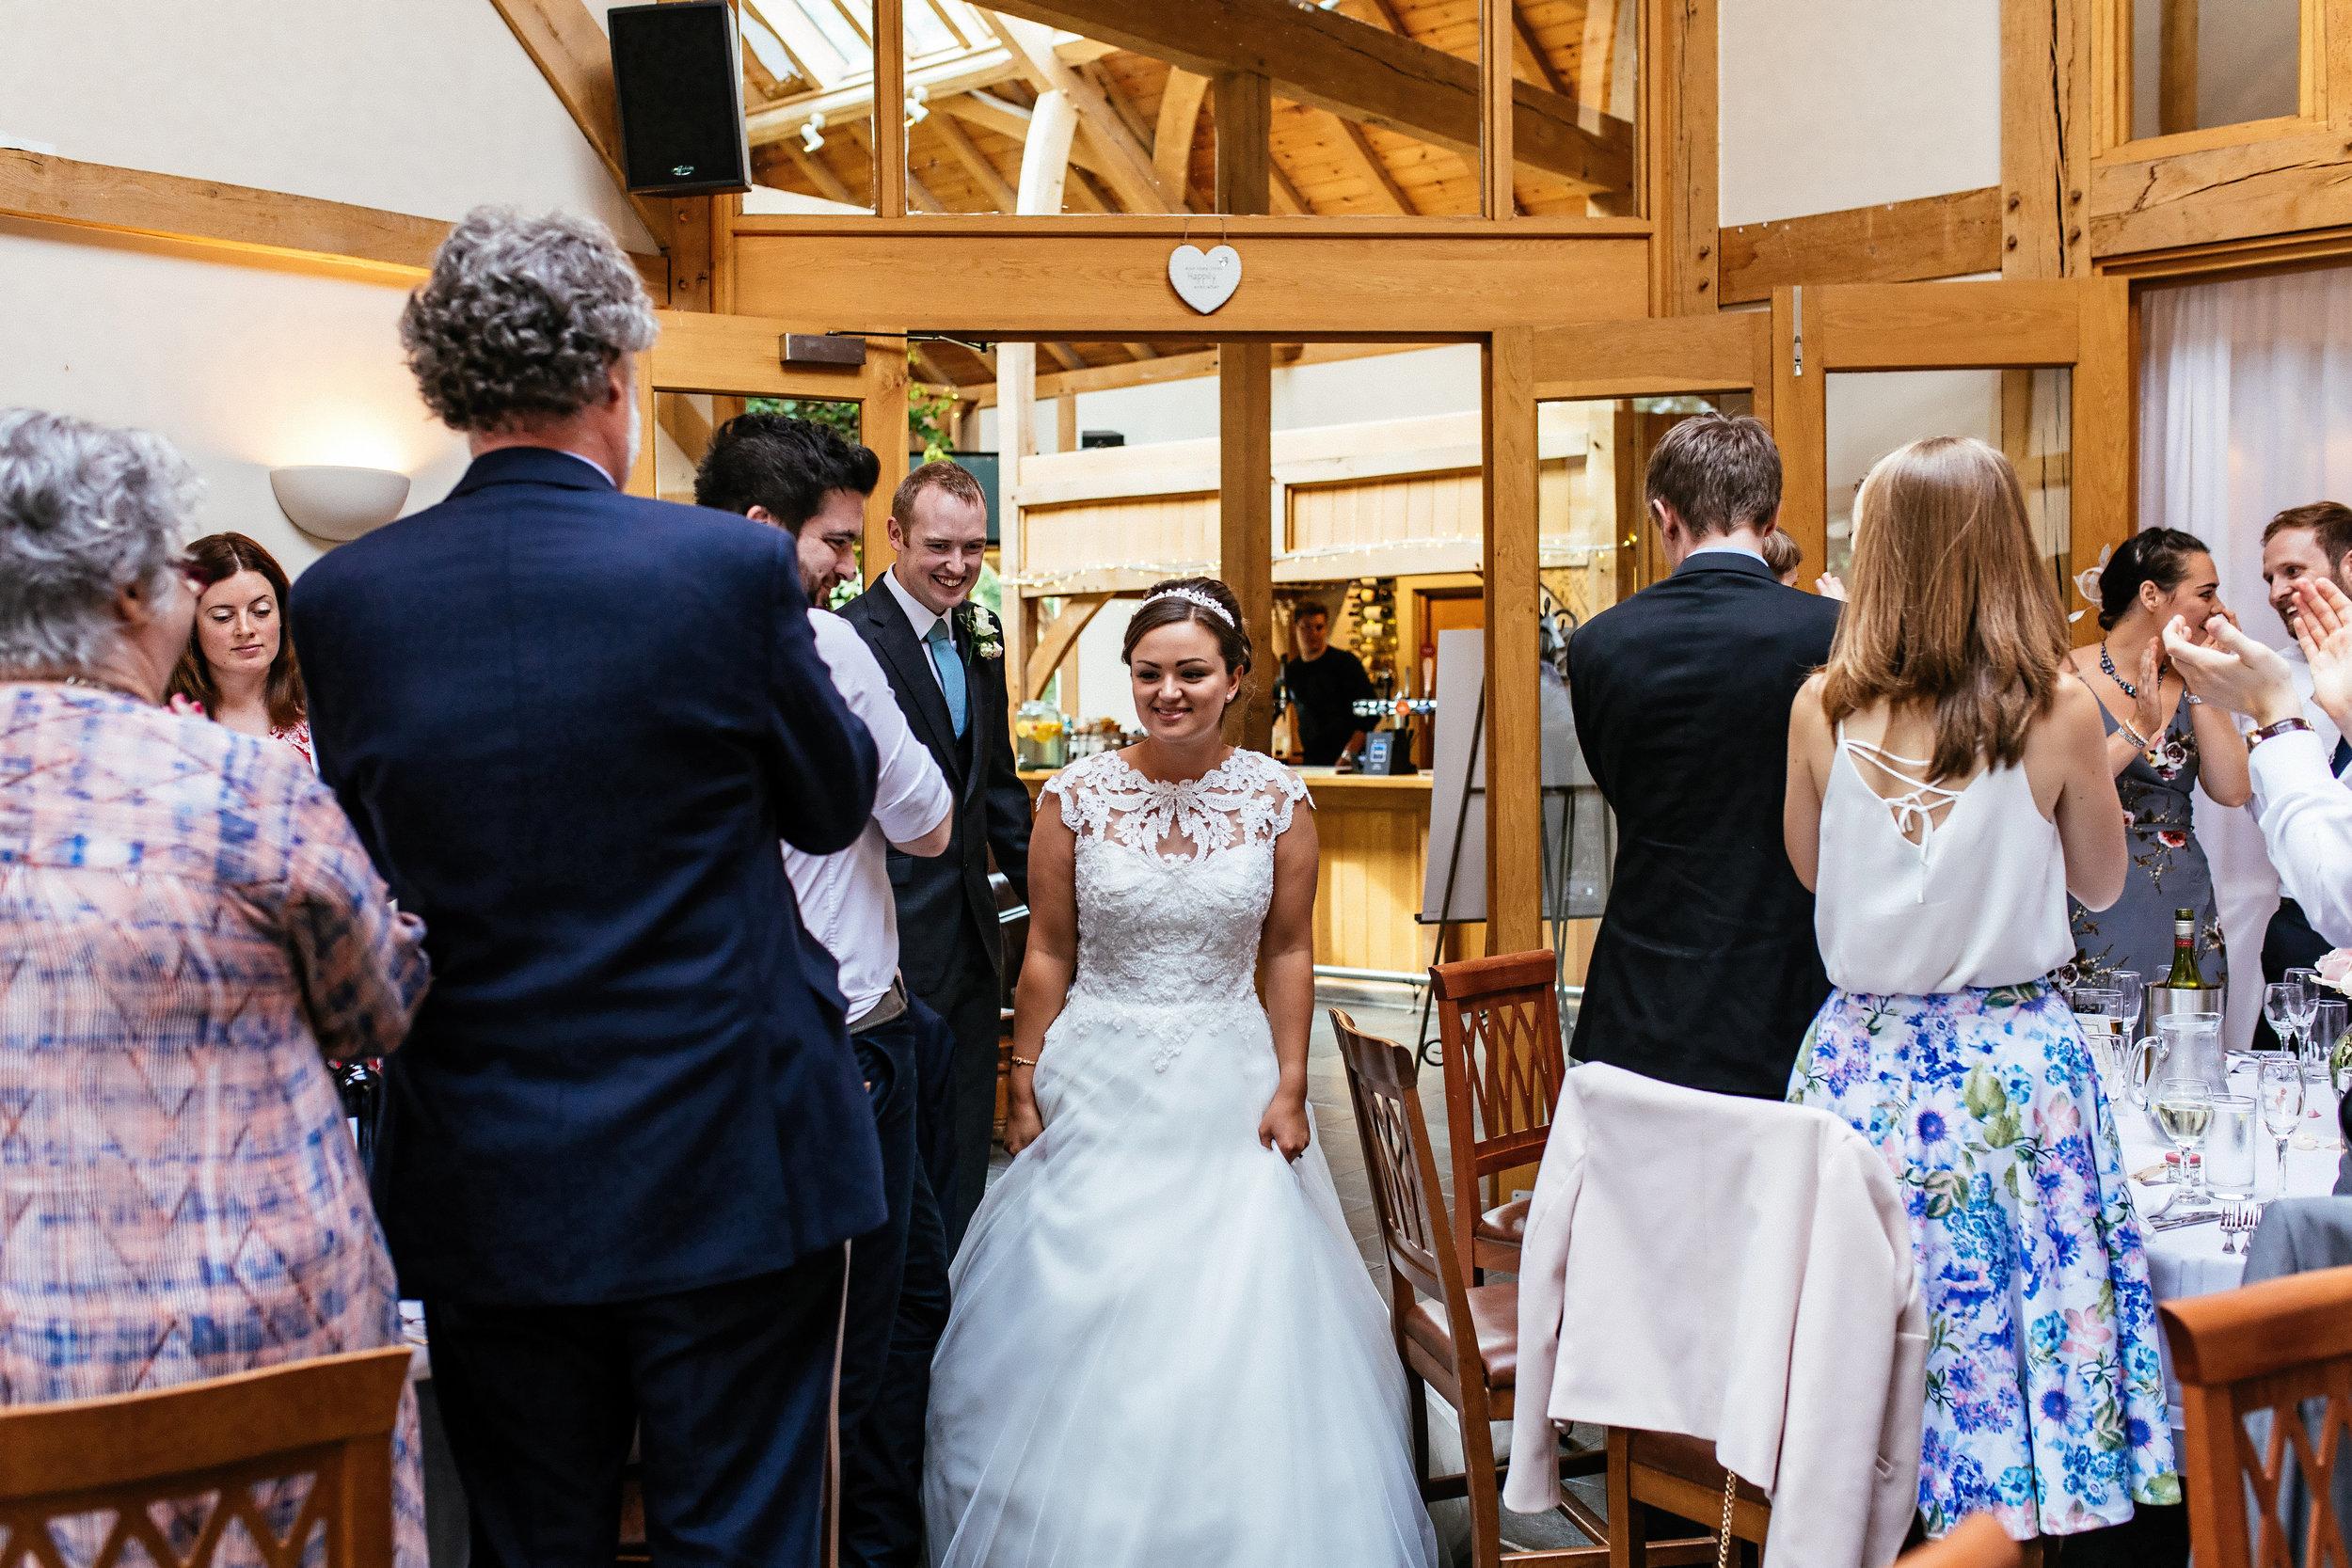 Emily-and-Peter-Wedding-Highlights-76.jpg